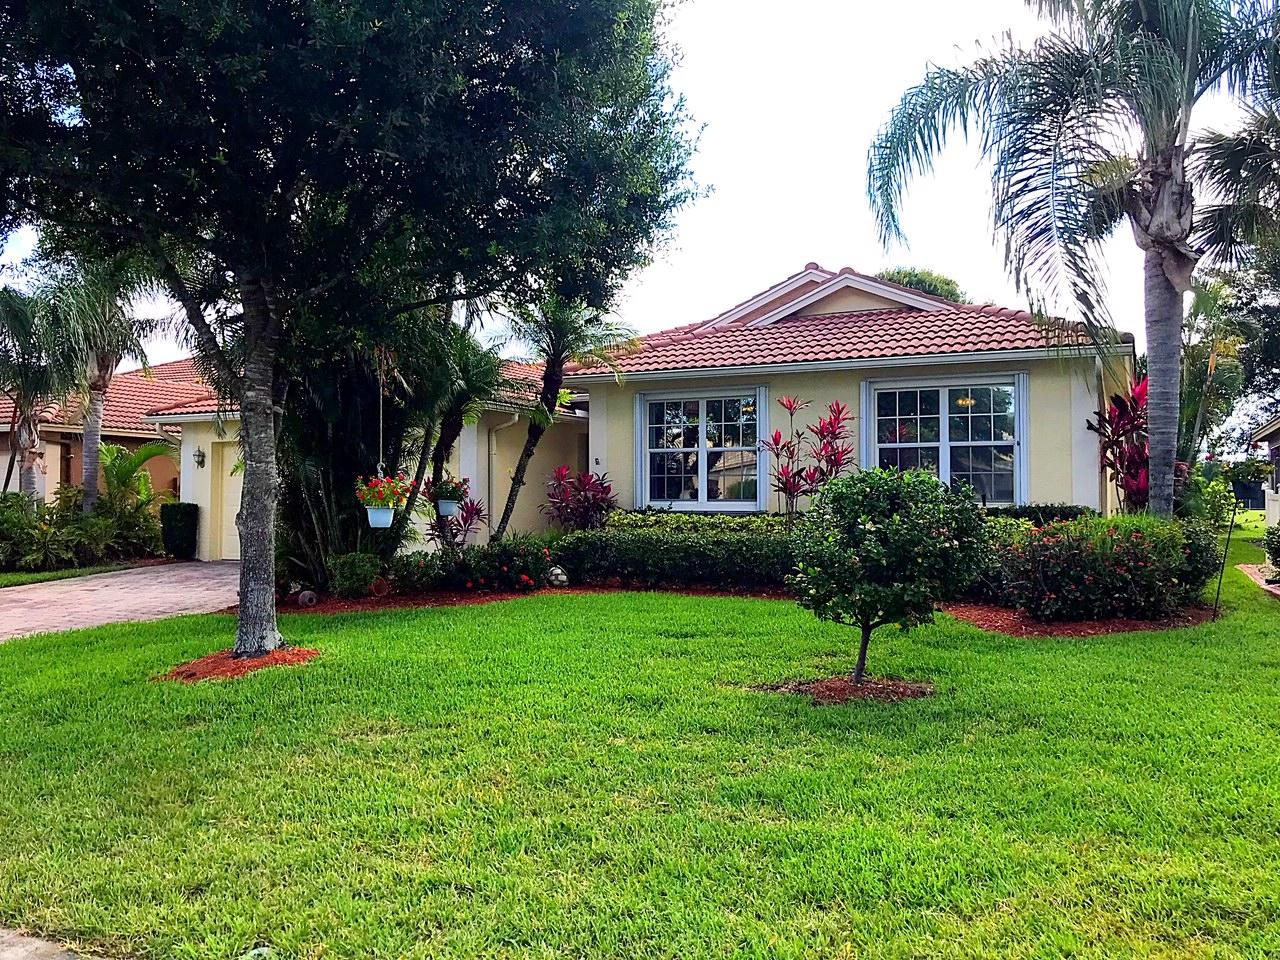 596 Nw Waverly Ne Circle, Port Saint Lucie, FL 34983